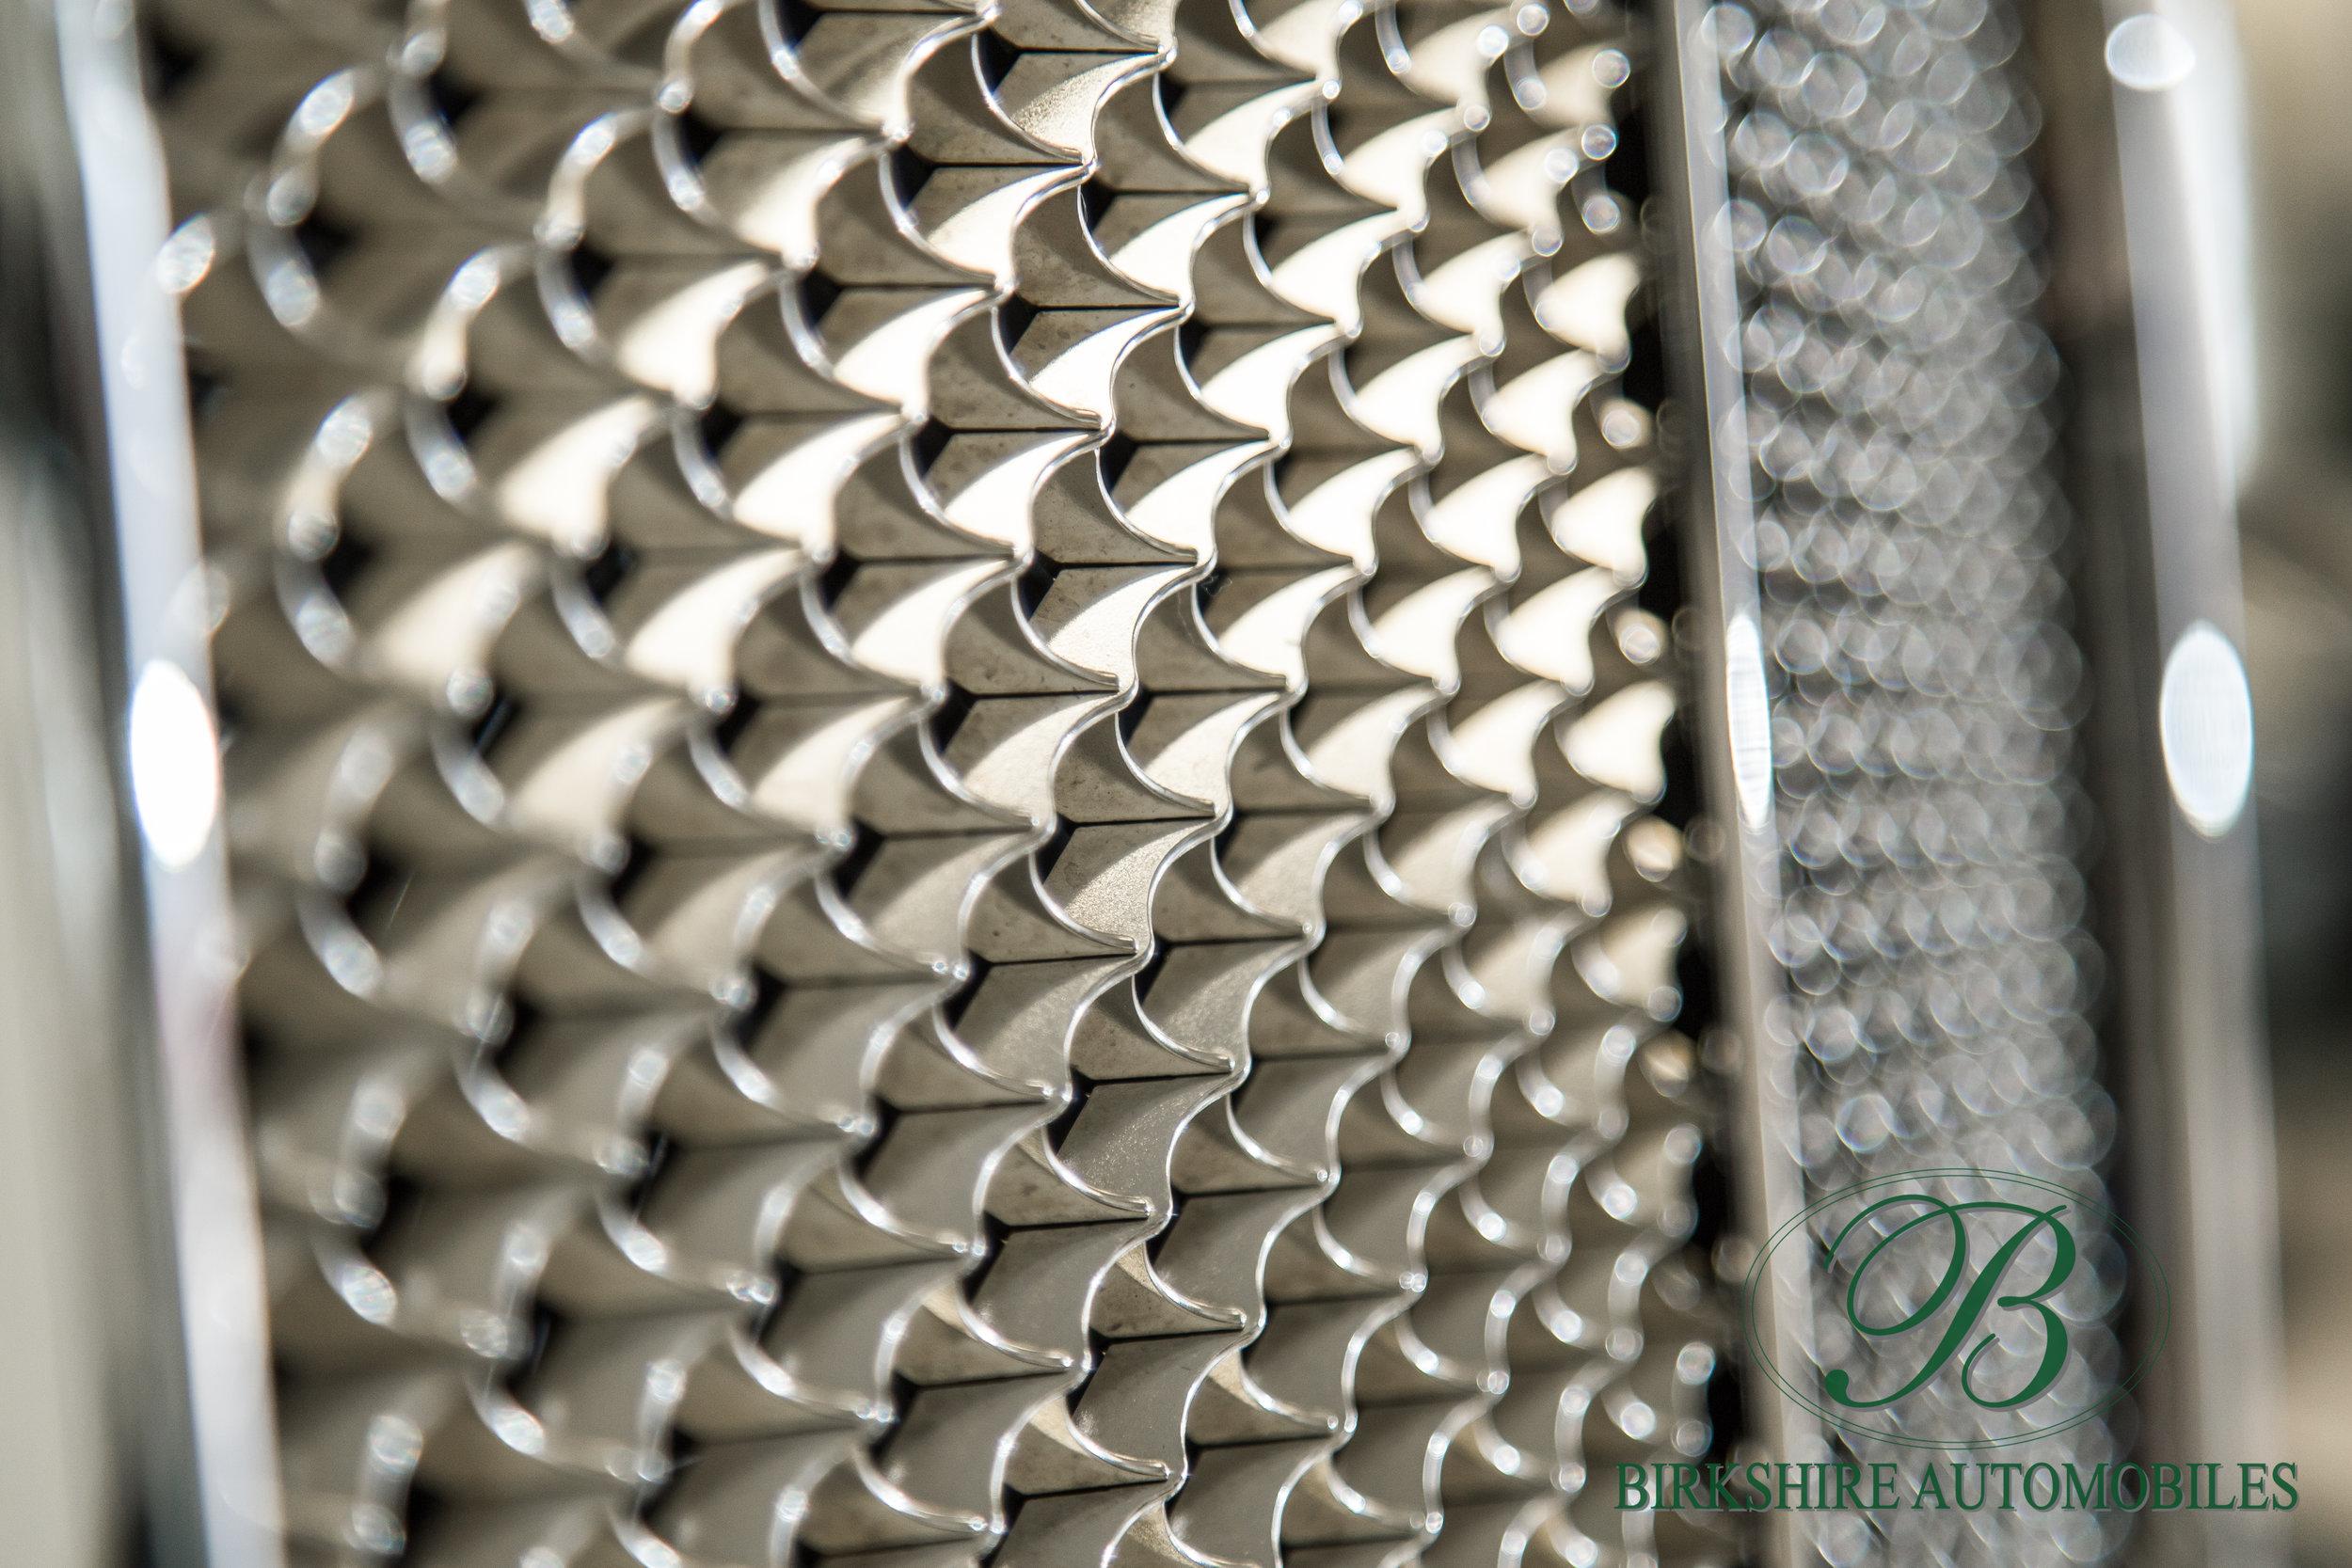 Birkshire Automobiles-338.jpg